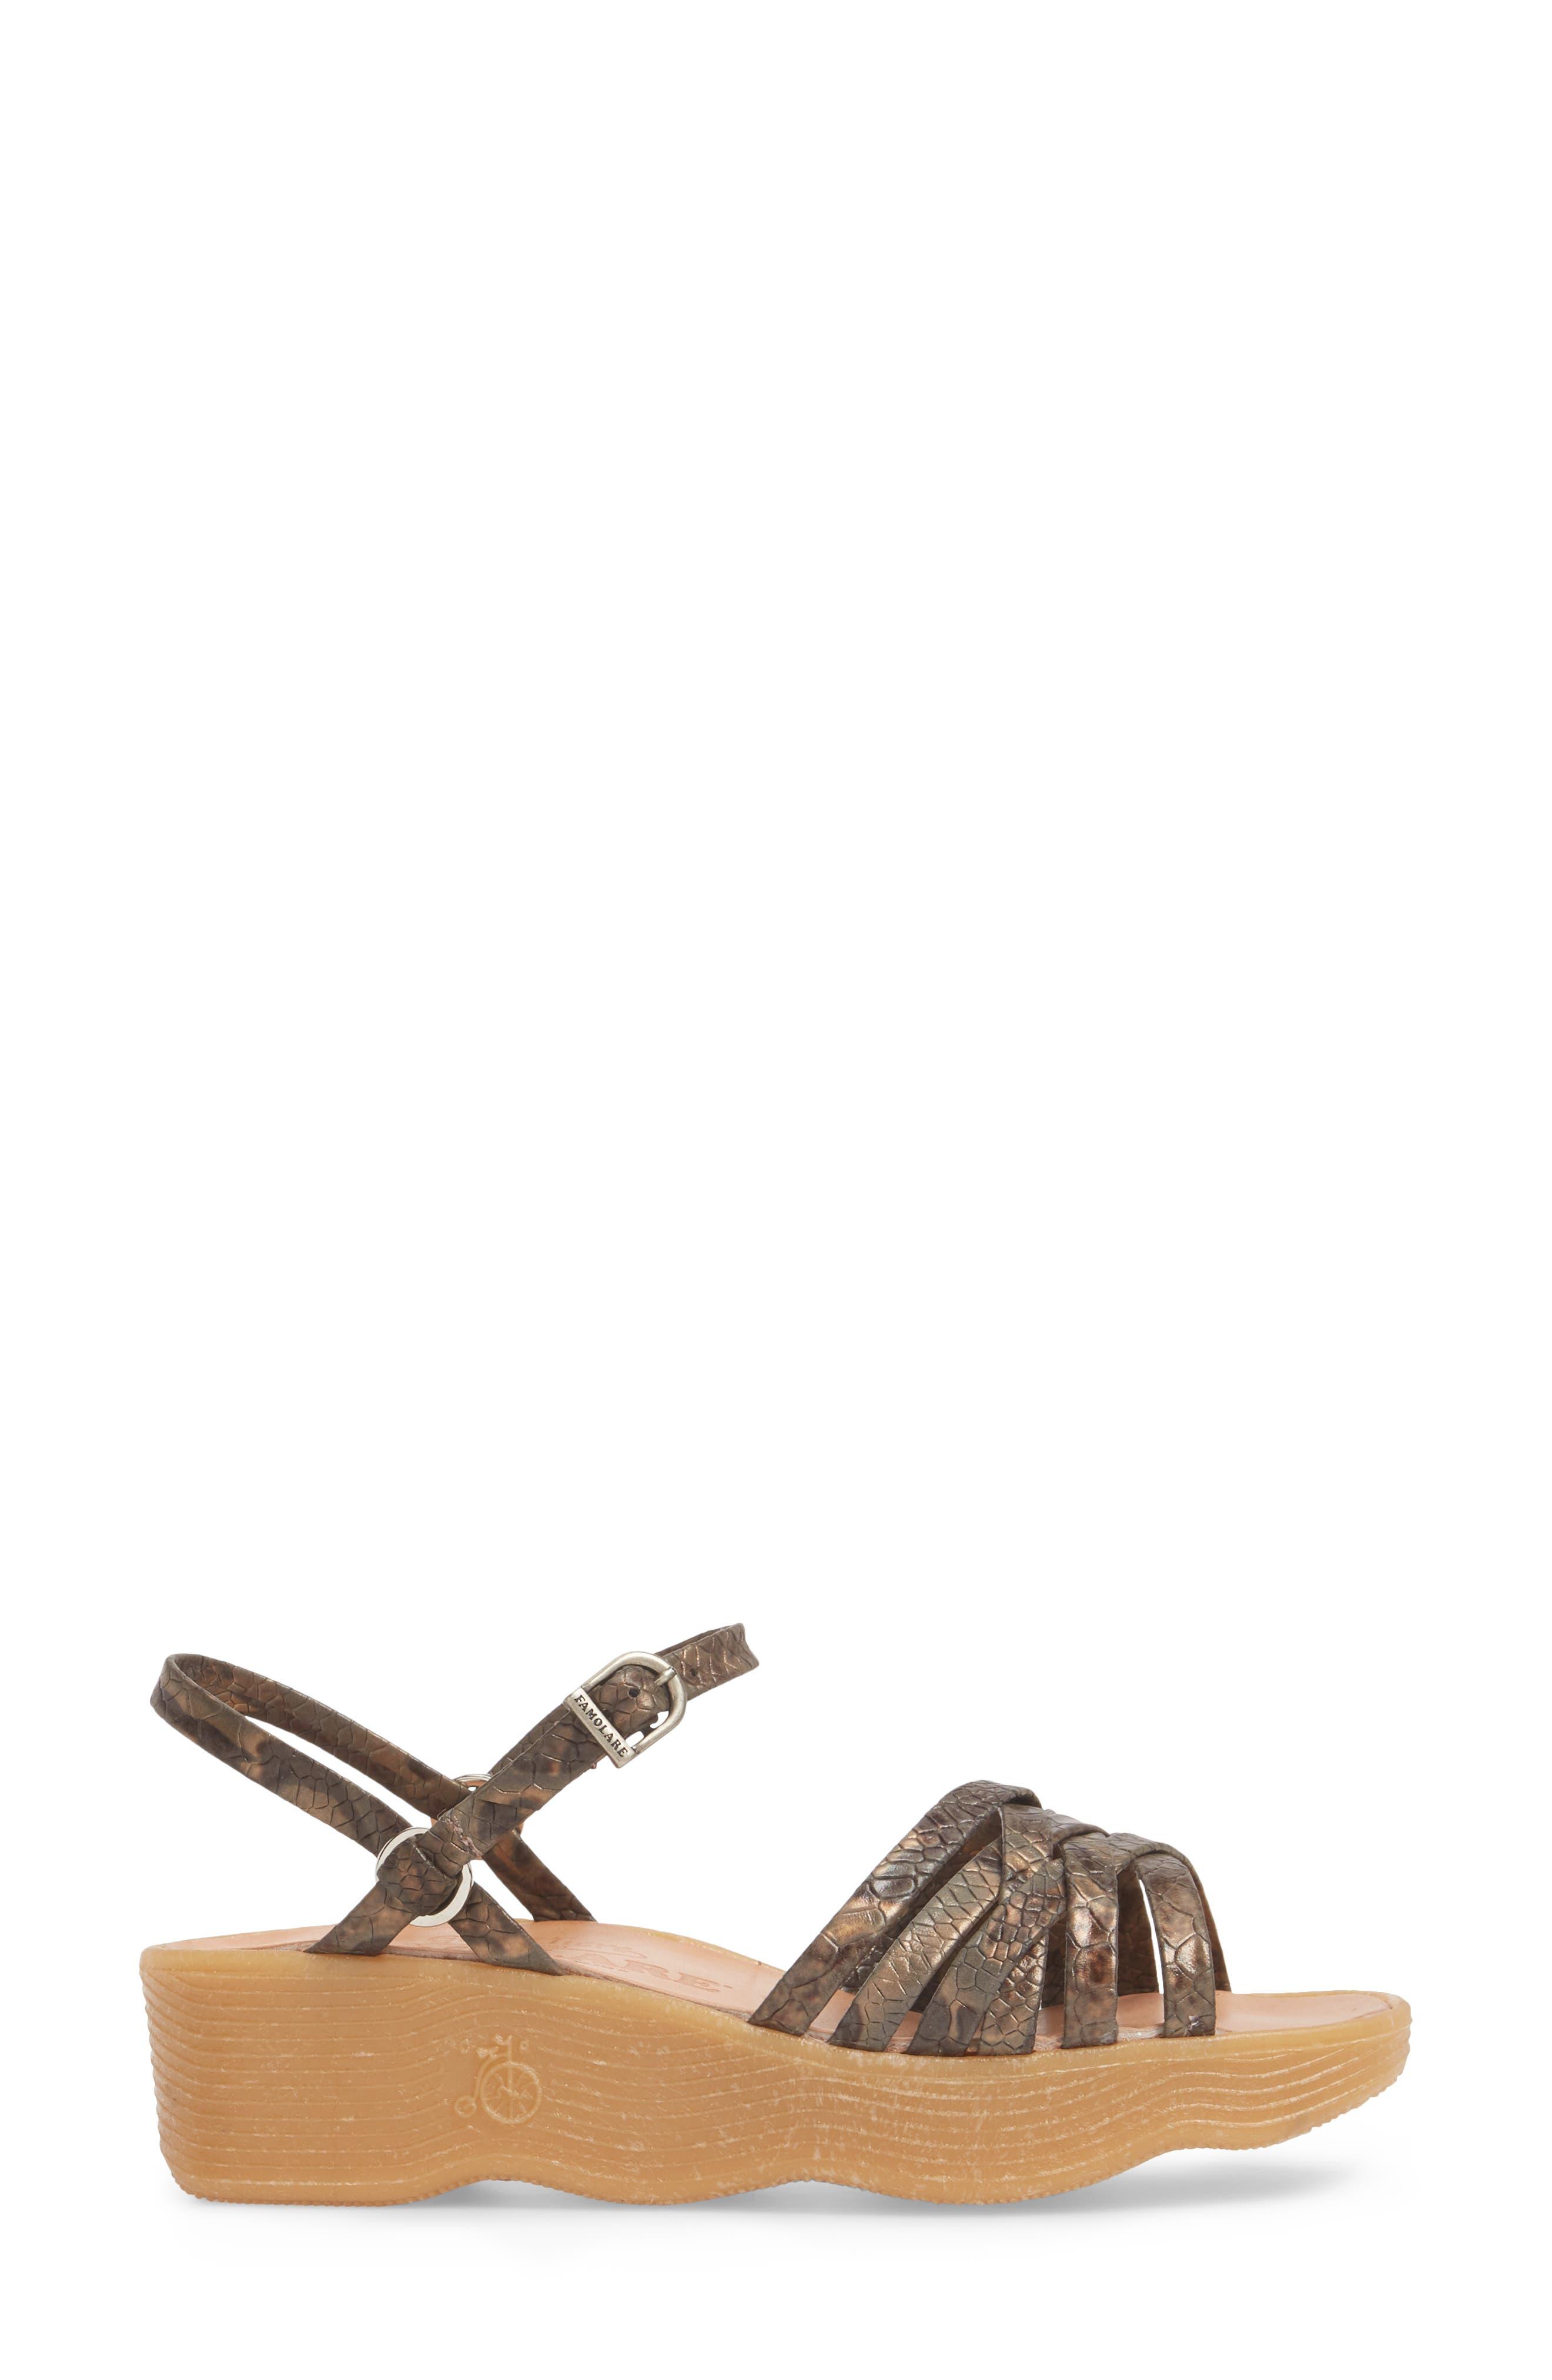 FAMOLARE, Strappy Camper Sandal, Alternate thumbnail 3, color, SNAKE PRINT LEATHER